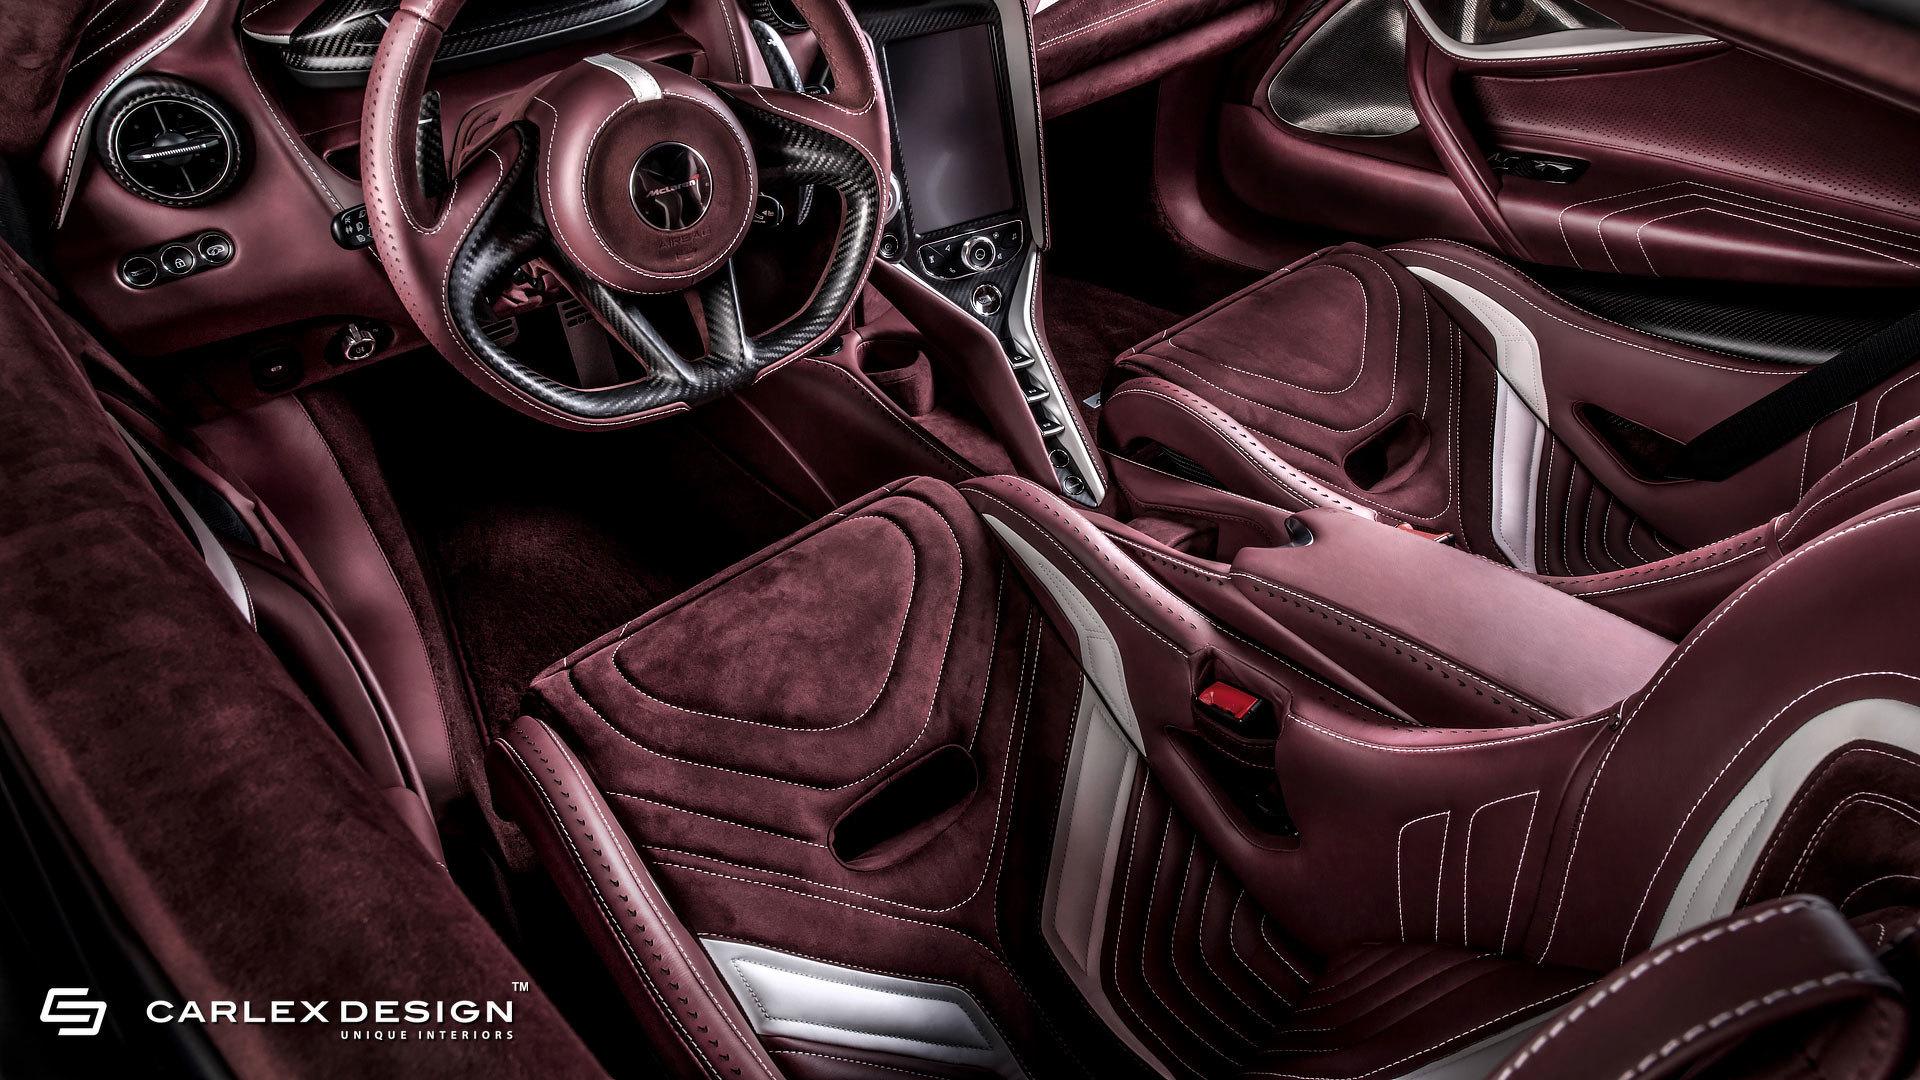 mclaren-720s-by-carlex-design (8)